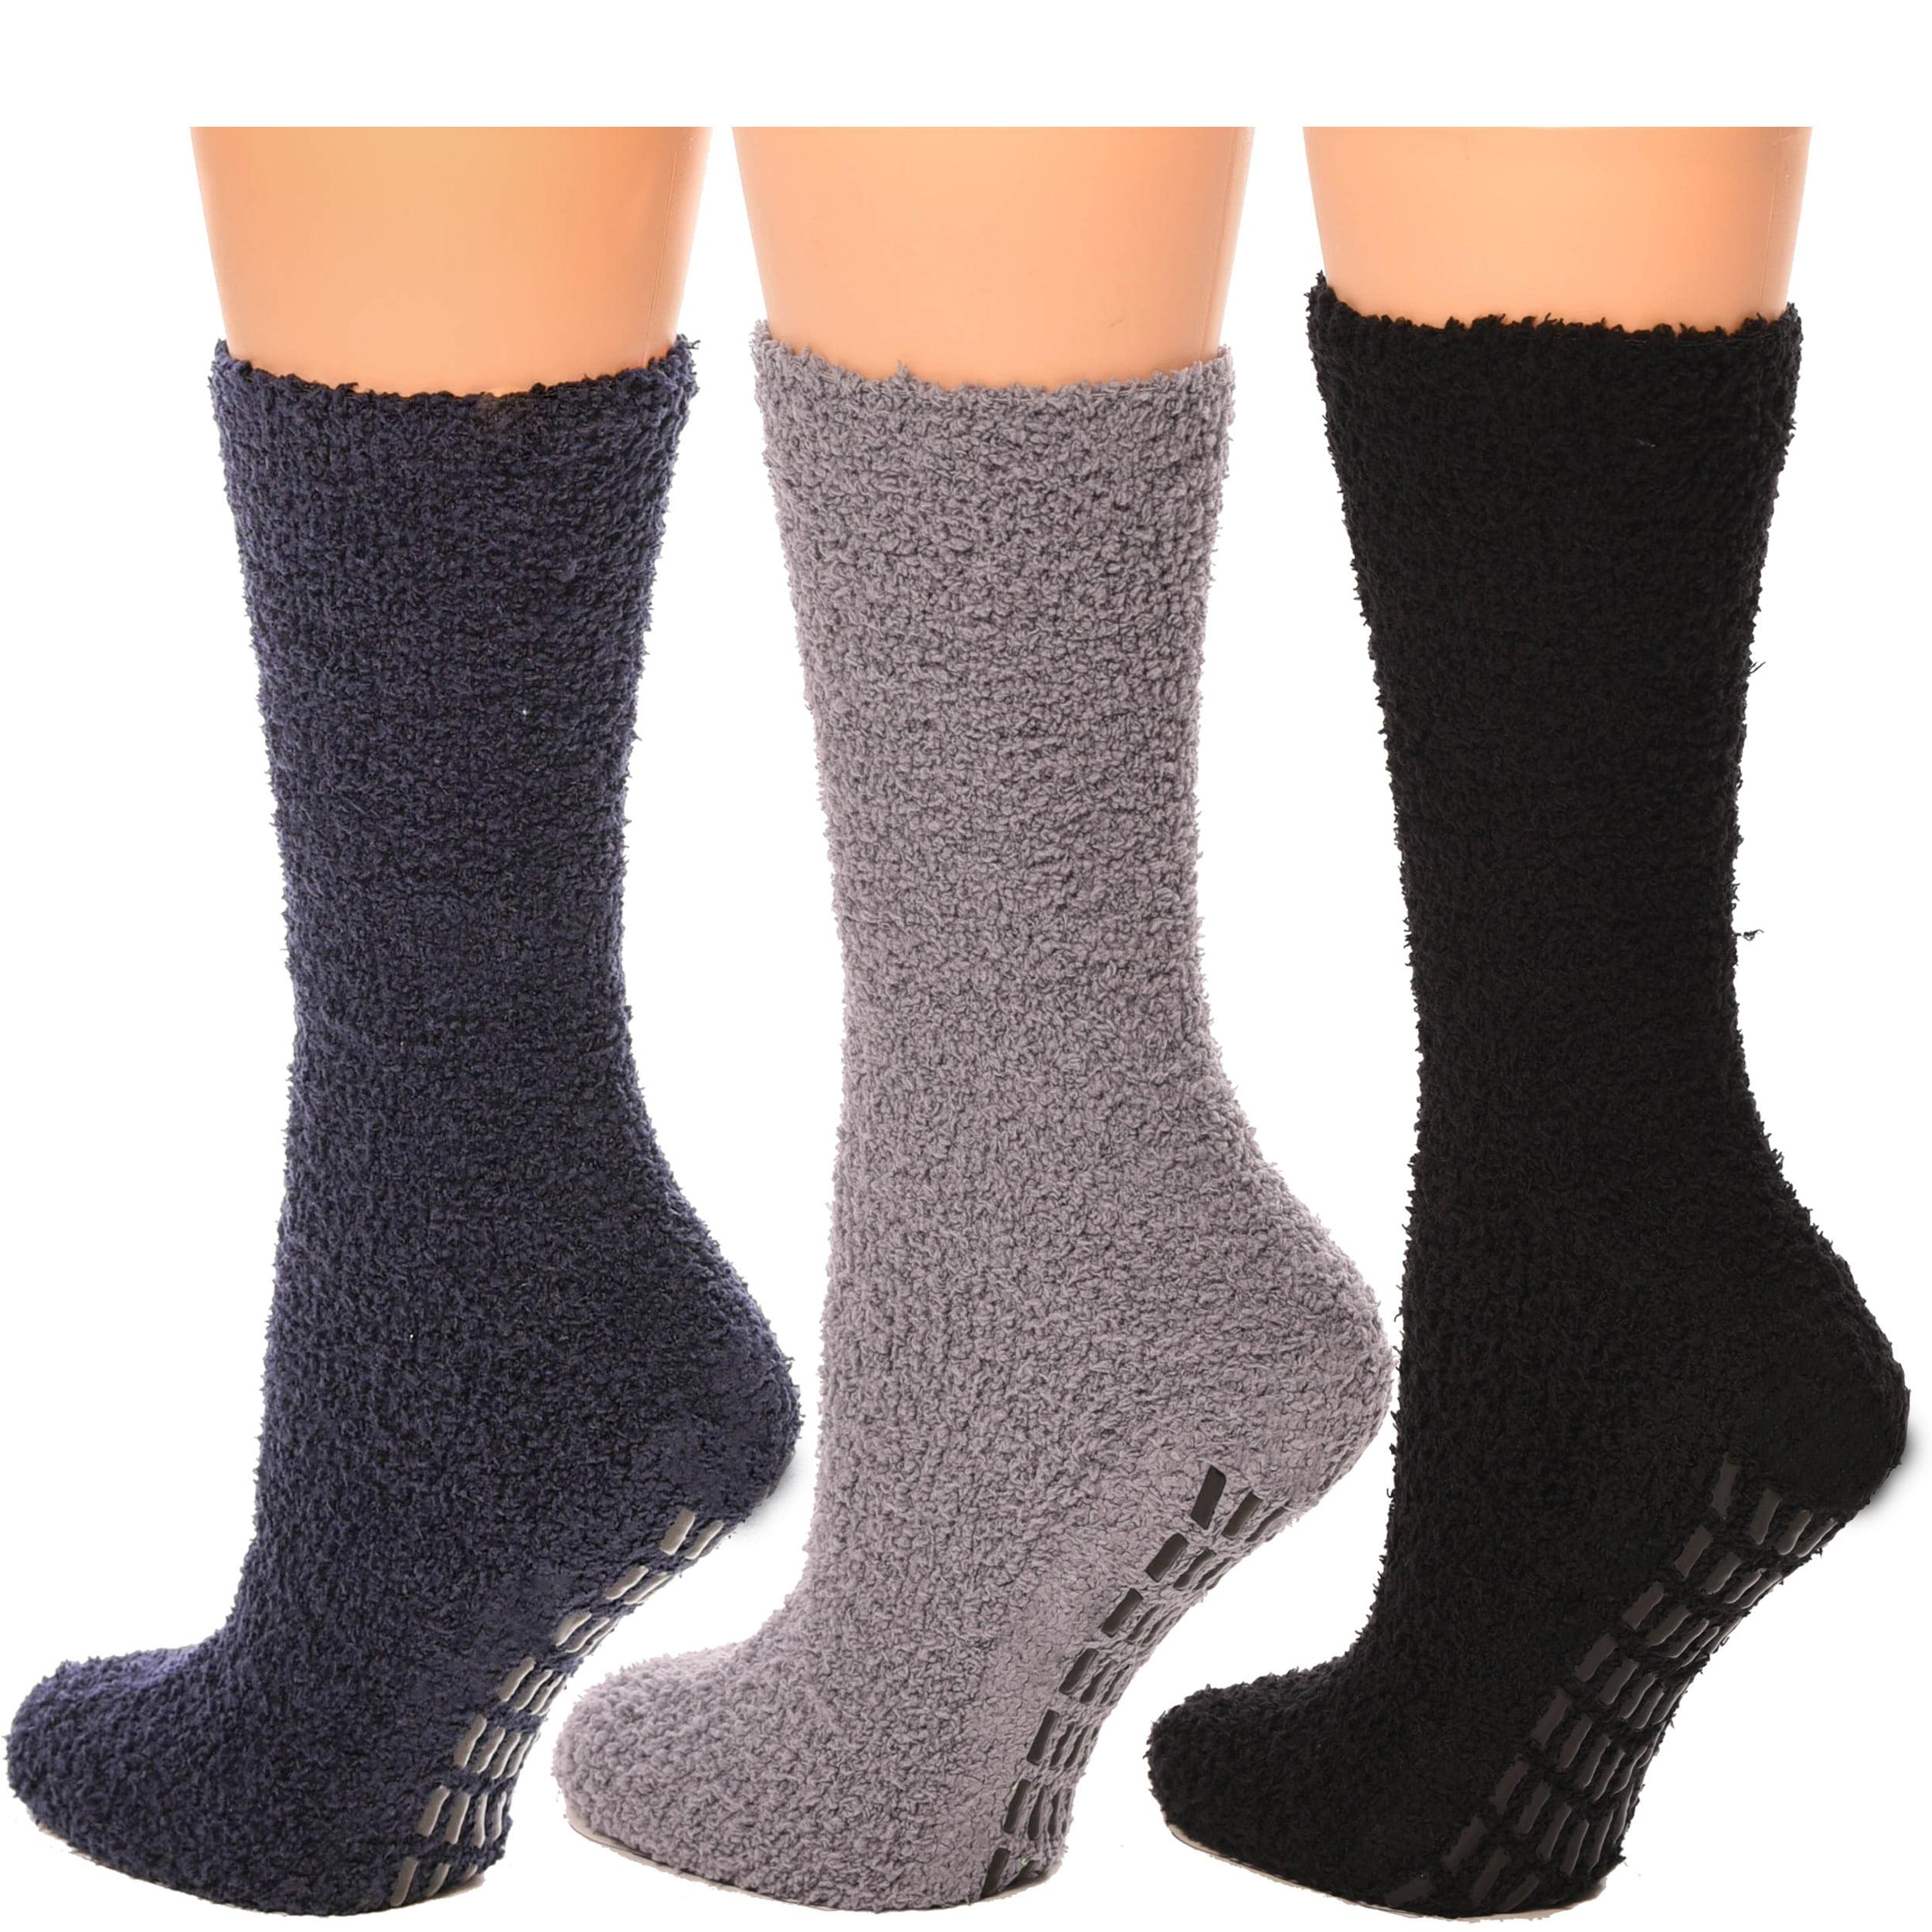 Debra Weitzner Non-slip Hospital Socks